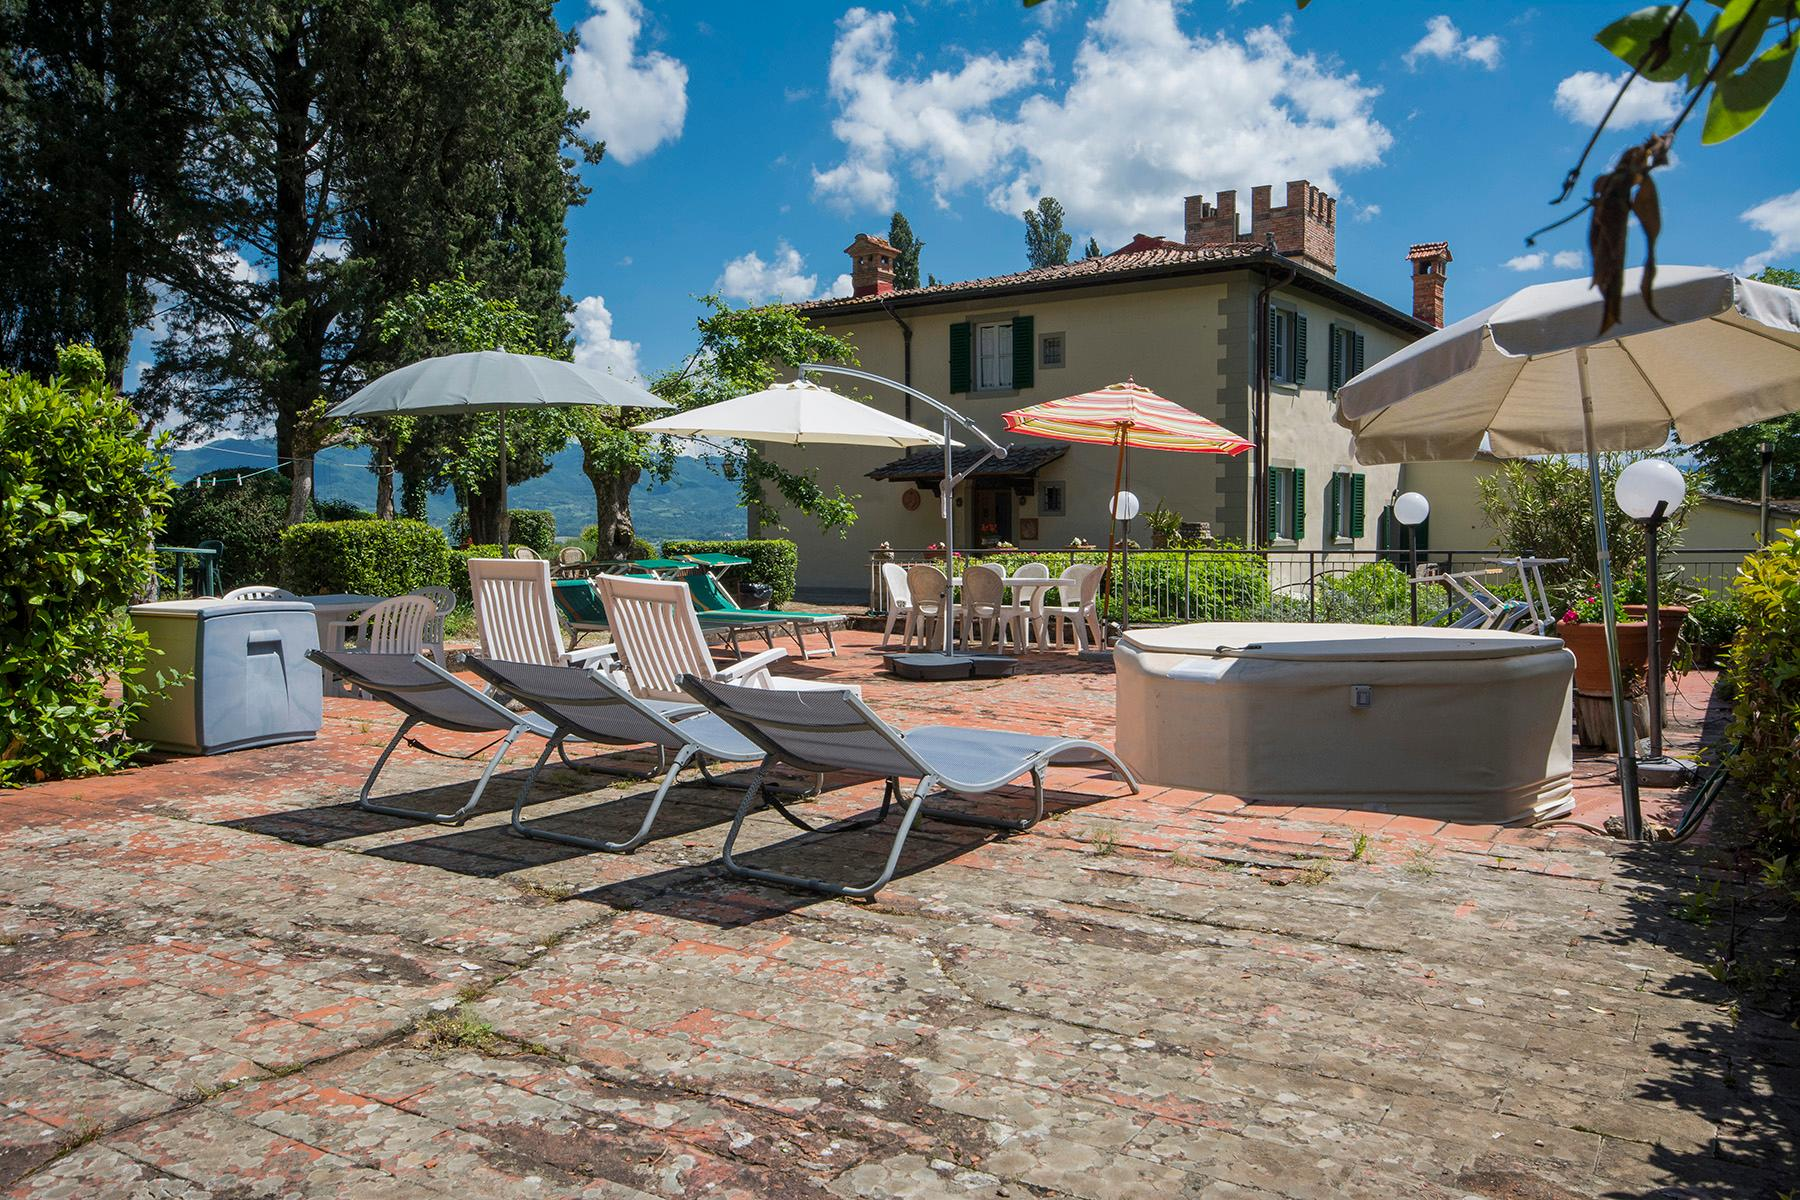 Villa charmante dans dans la Val di Sieve - 5